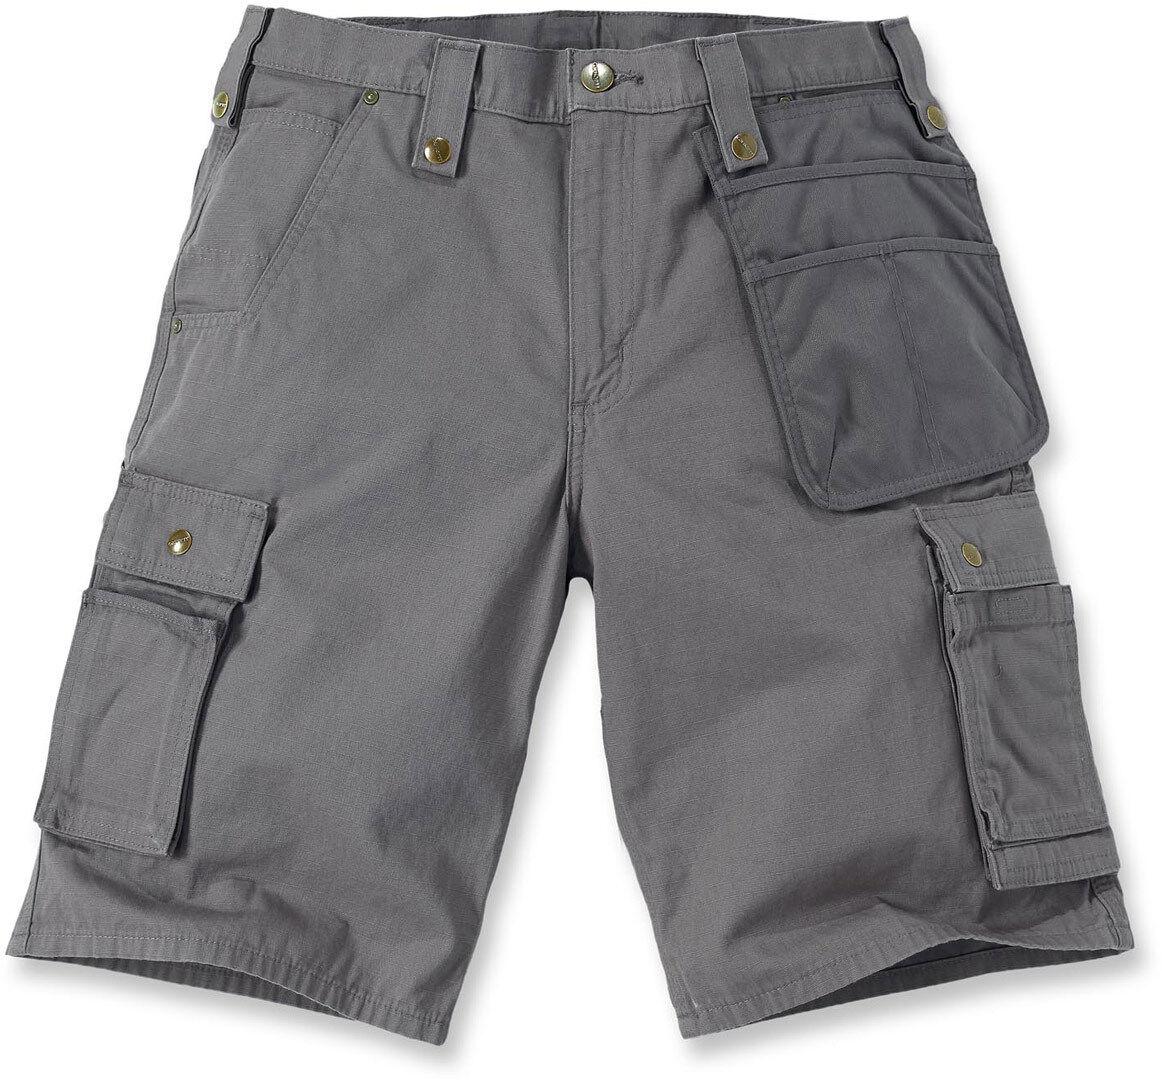 Carhartt Multi Pocket Ripstop Pantalones cortos Gris 38